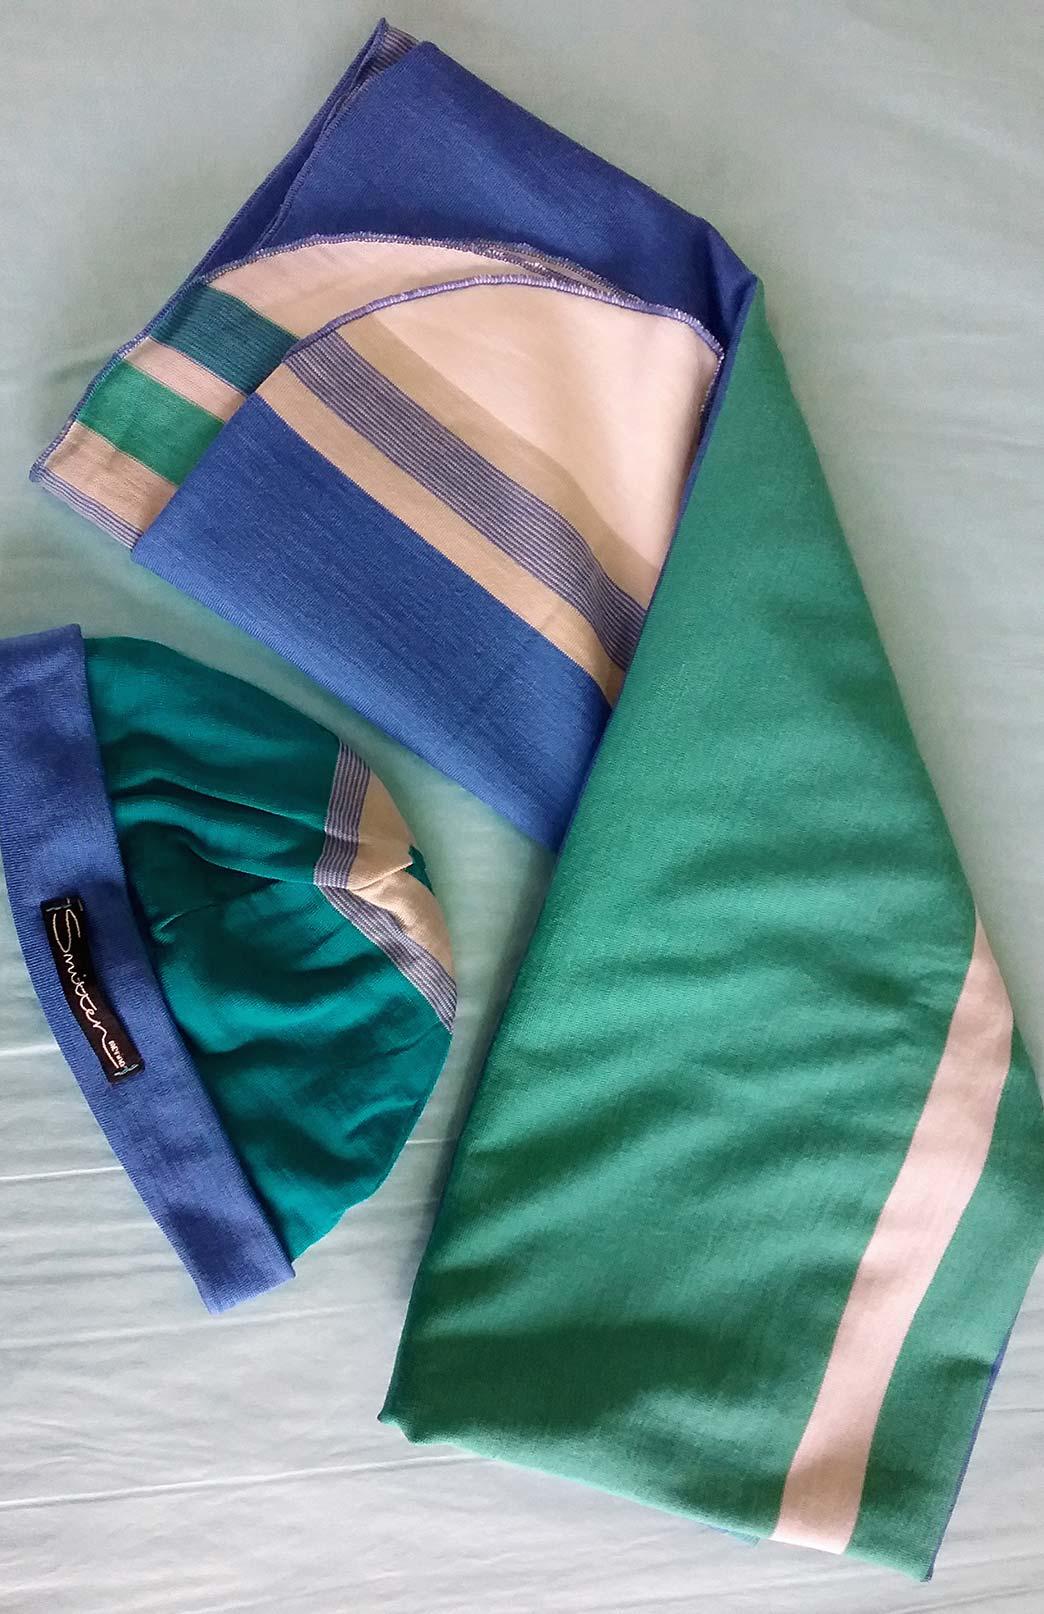 Baby Wrap and Beanie Set - Merino Wool Baby Wrap Blanket and Beanie Gift Set - Smitten Merino Tasmania Australia